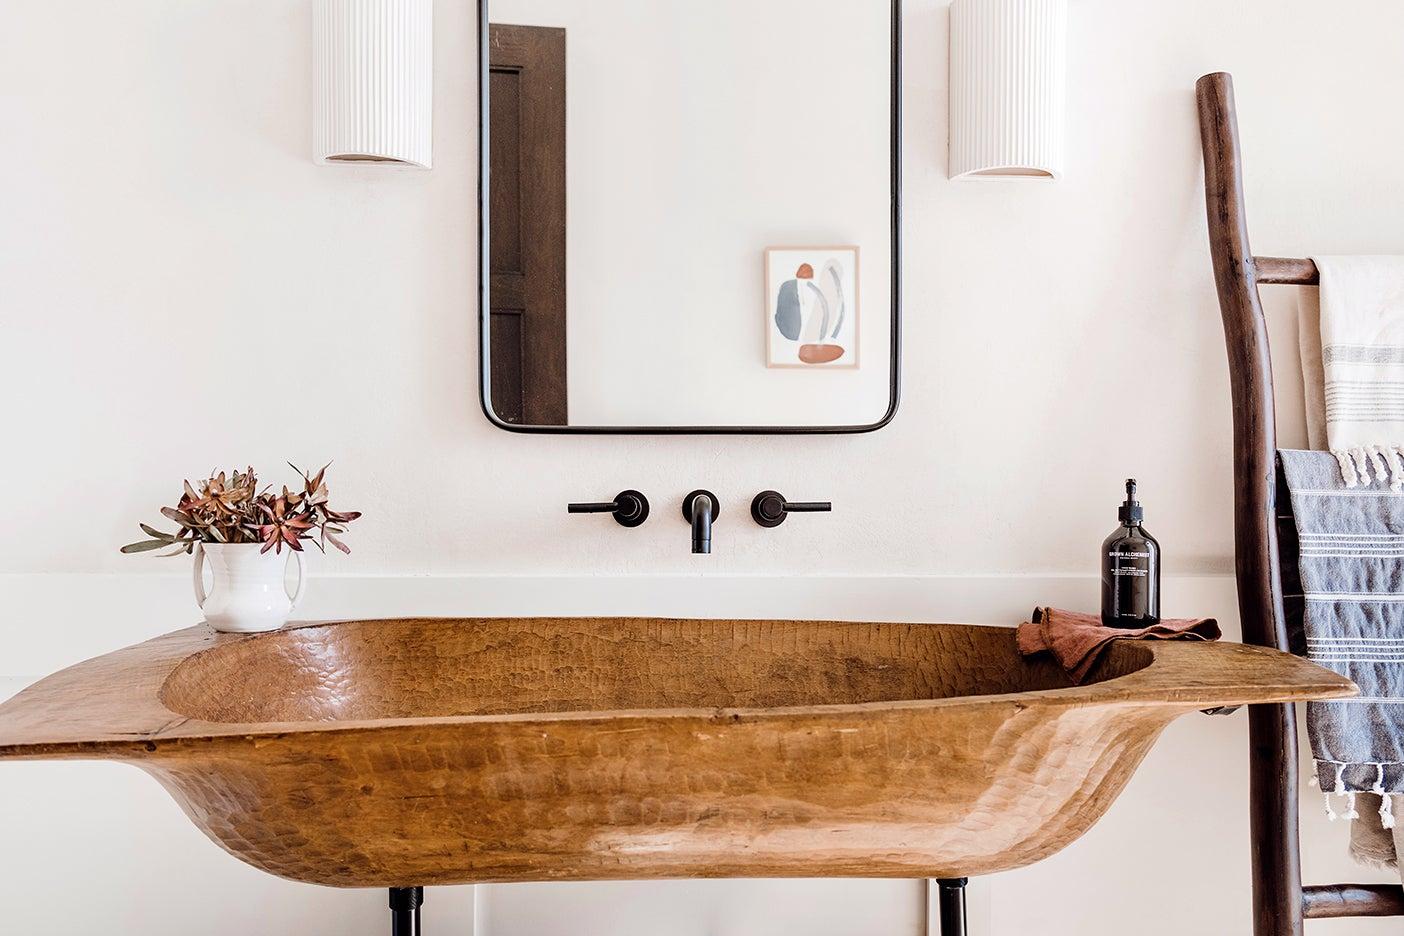 long wooden bowl sink